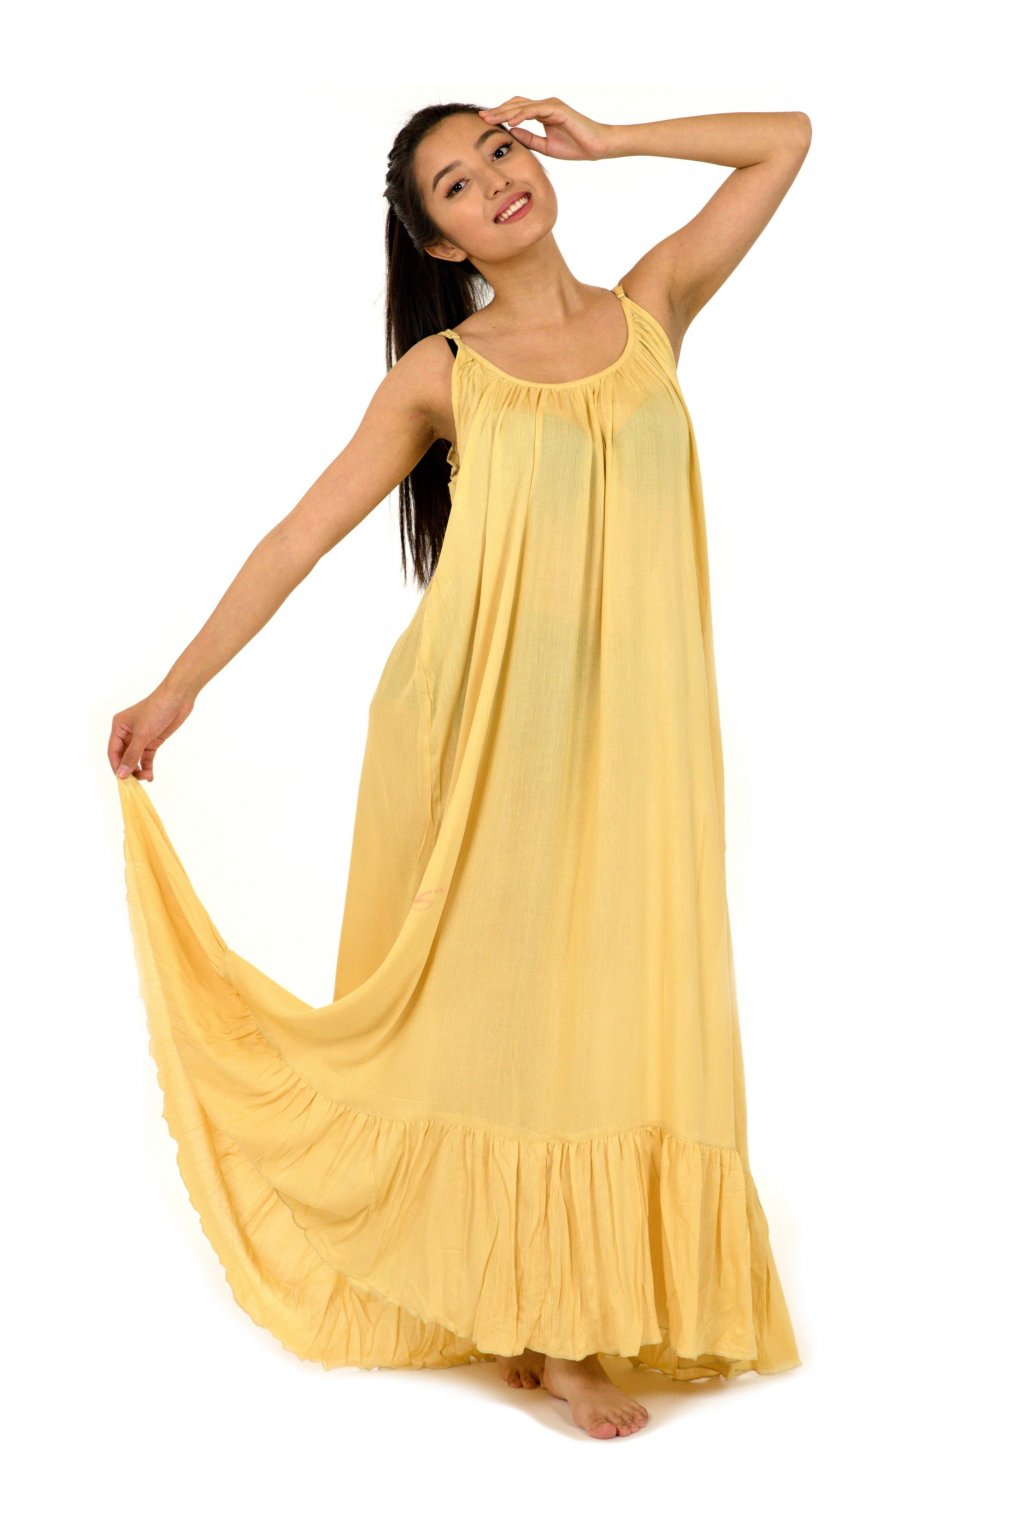 Vzdušné maxi šaty Mililani - béžové